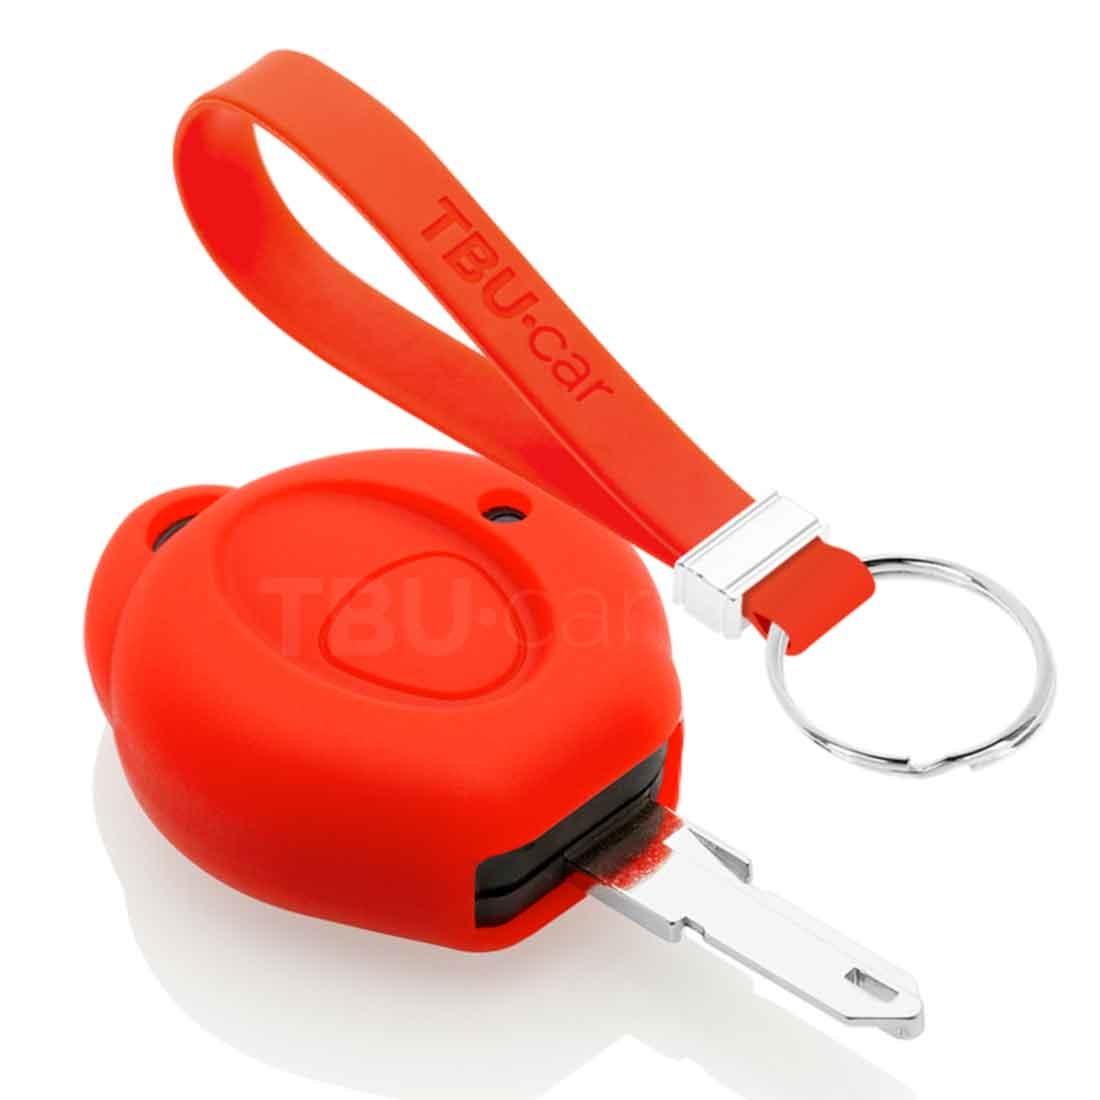 TBU car TBU car Autoschlüssel Hülle kompatibel mit Peugeot 1 Taste - Schutzhülle aus Silikon - Auto Schlüsselhülle Cover in Rot